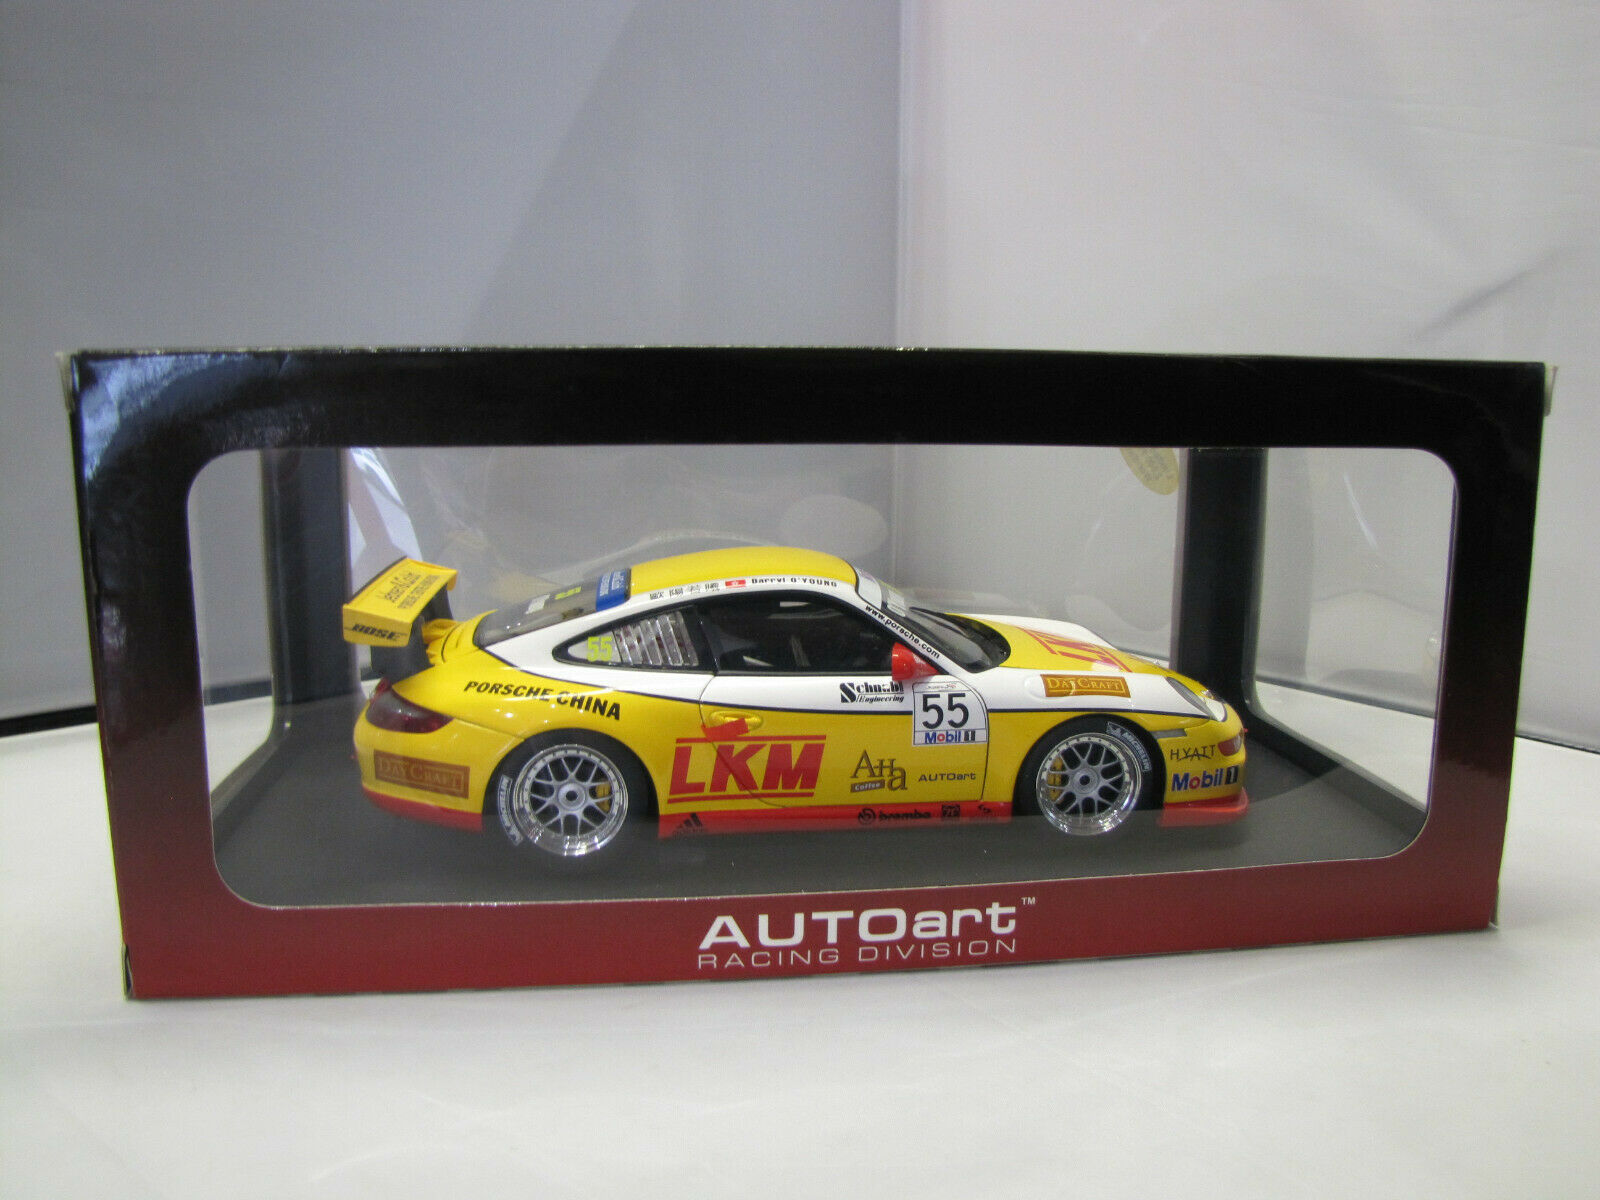 80785 AutoArt Porsche 911 gt3 (997) CARRERA CUP ASIA Nº Nº Nº 55 - 1 18 ecac51